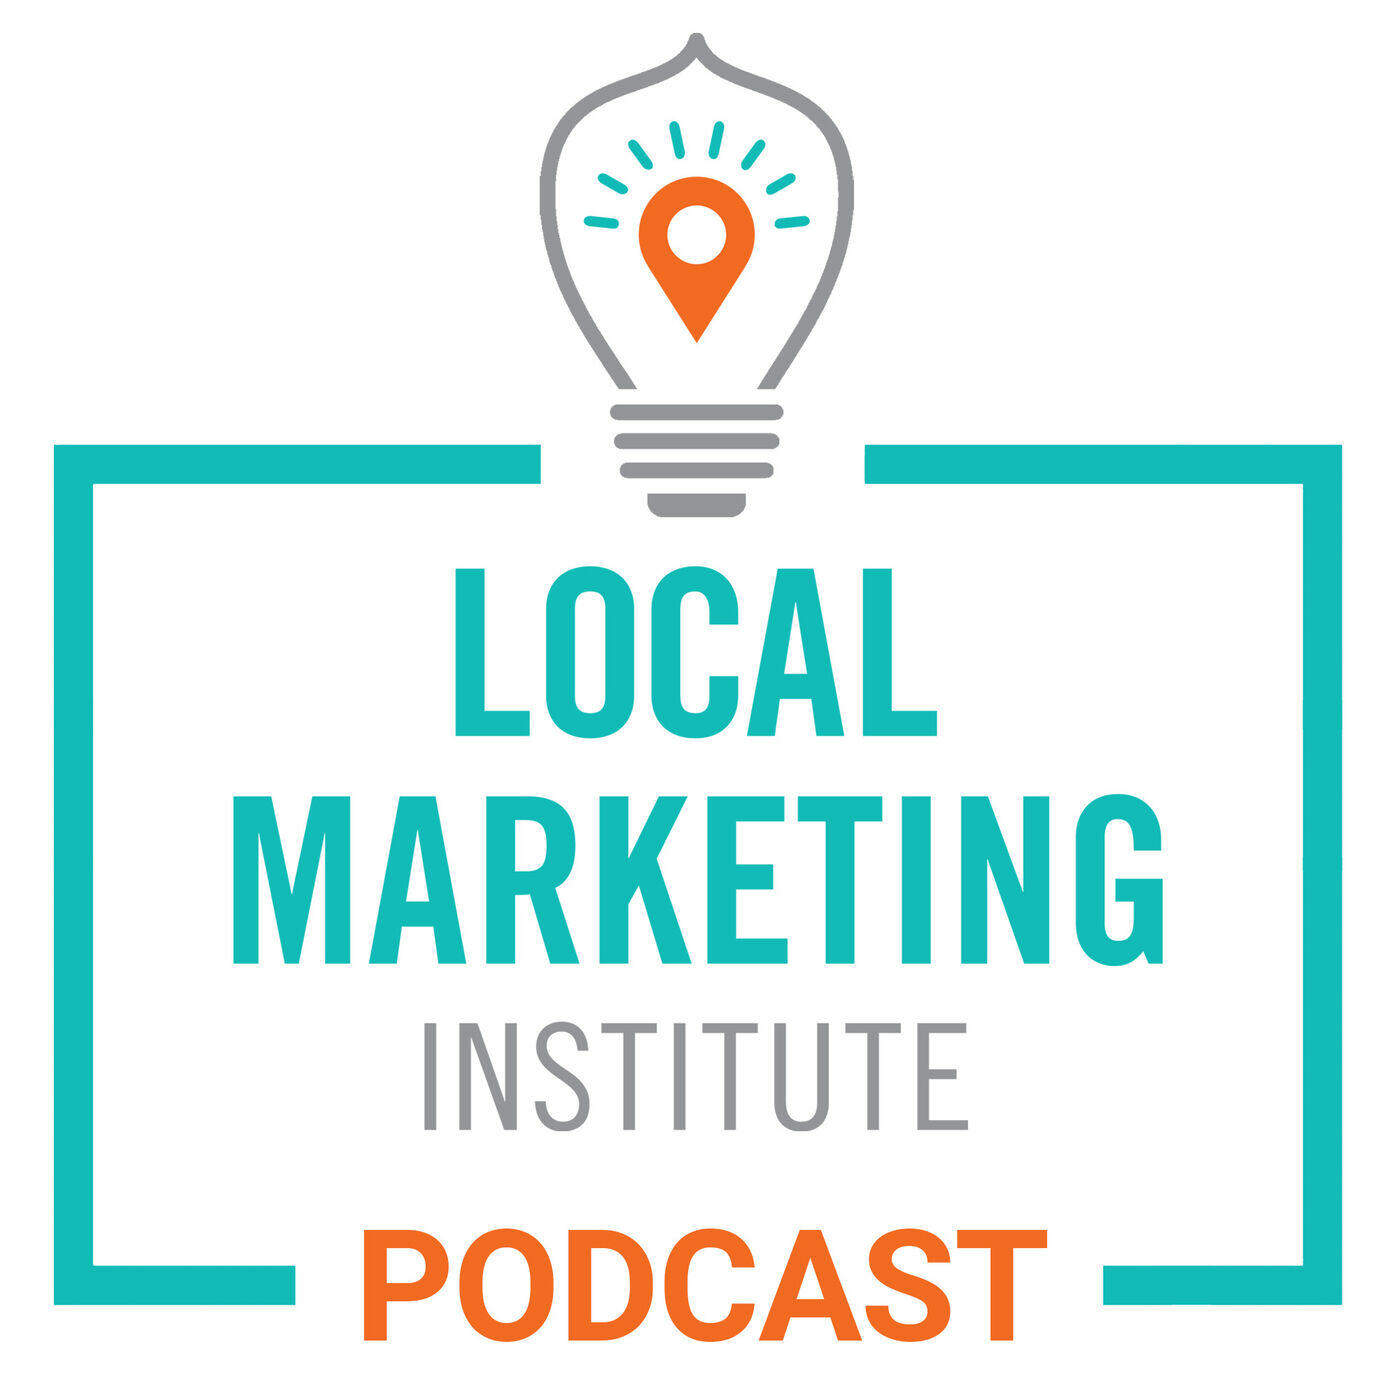 Local Marketing Institute Podcast